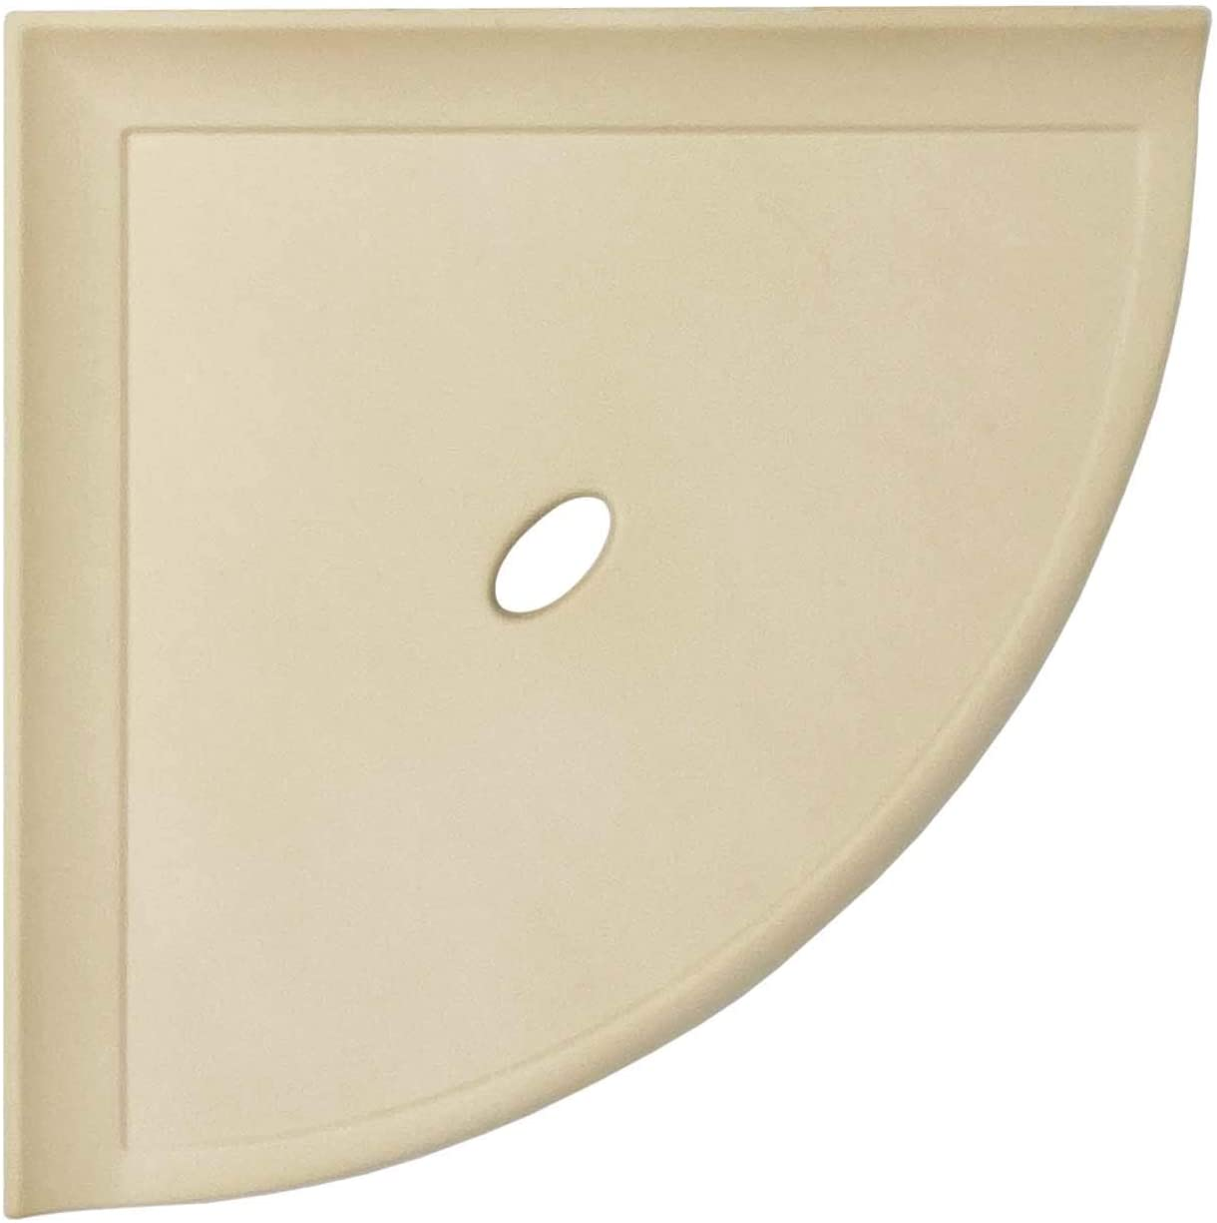 8 inch Corner Max 51% OFF Shower Shelf - Matte Mounted Latest item Wall Or Sand Bathroom